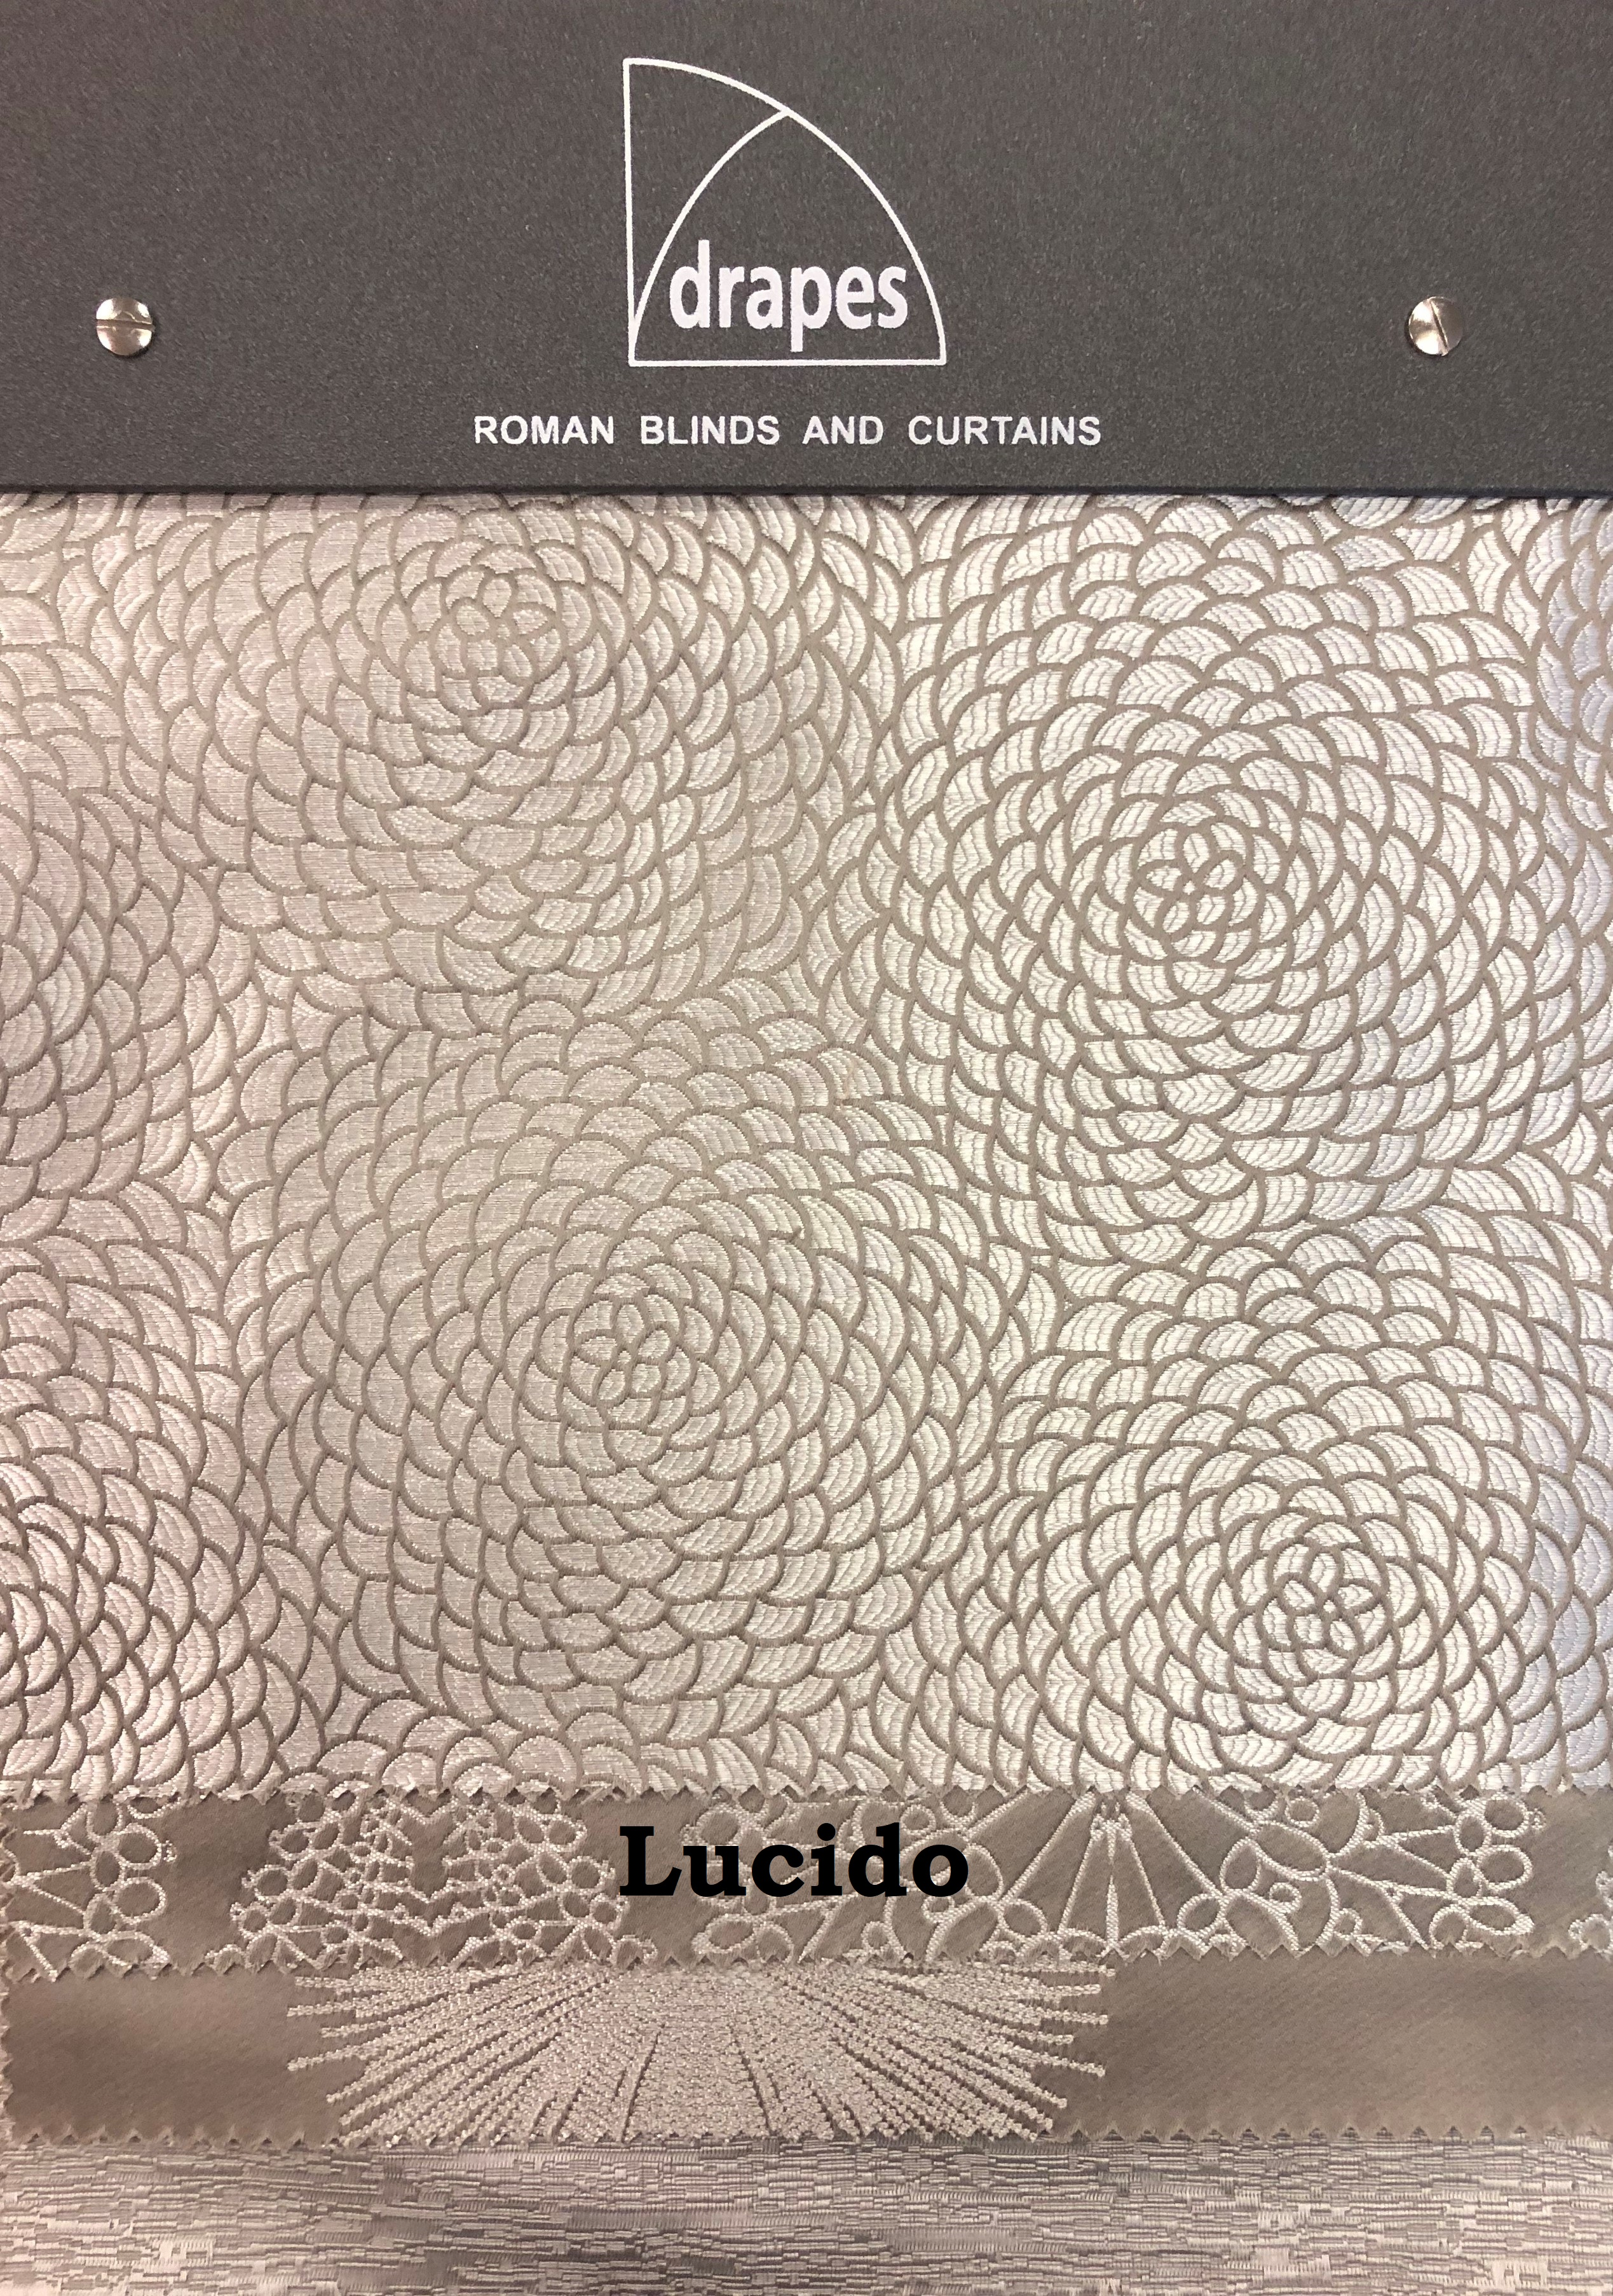 Lucido Book